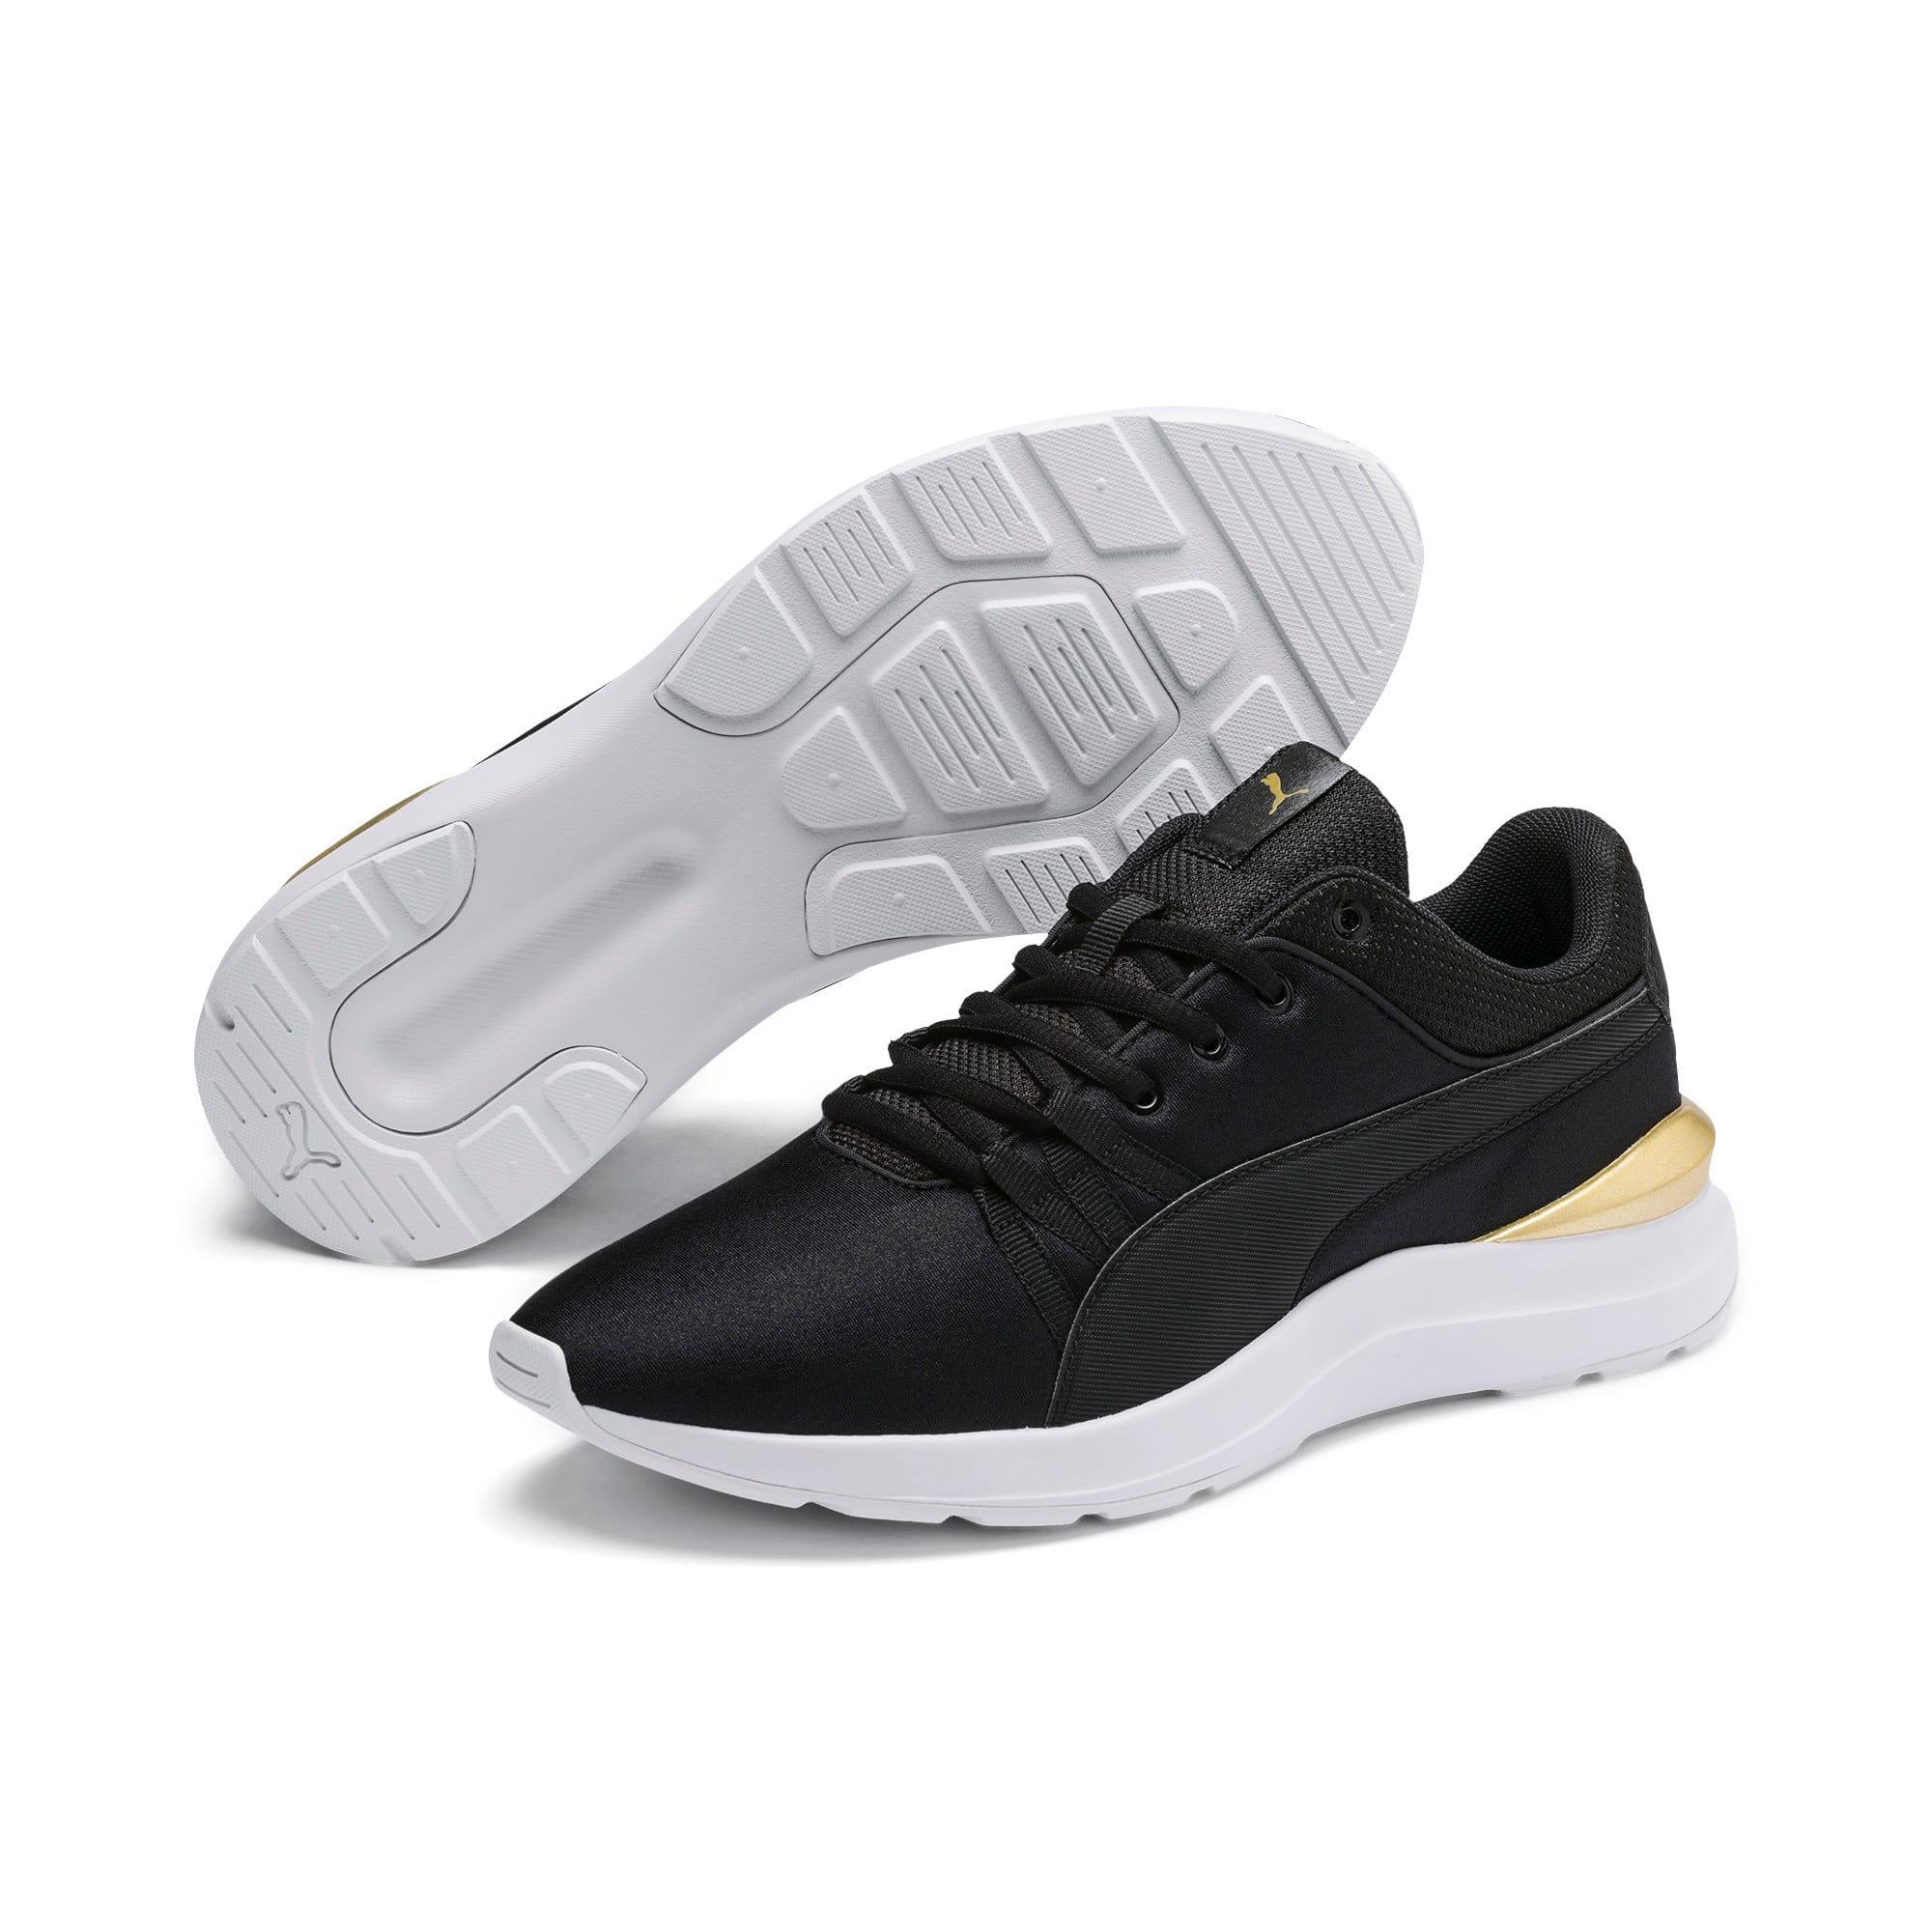 Thumbnail 2 of Adela Satin Women's Sneakers, Puma Black - Puma Black, medium-IND